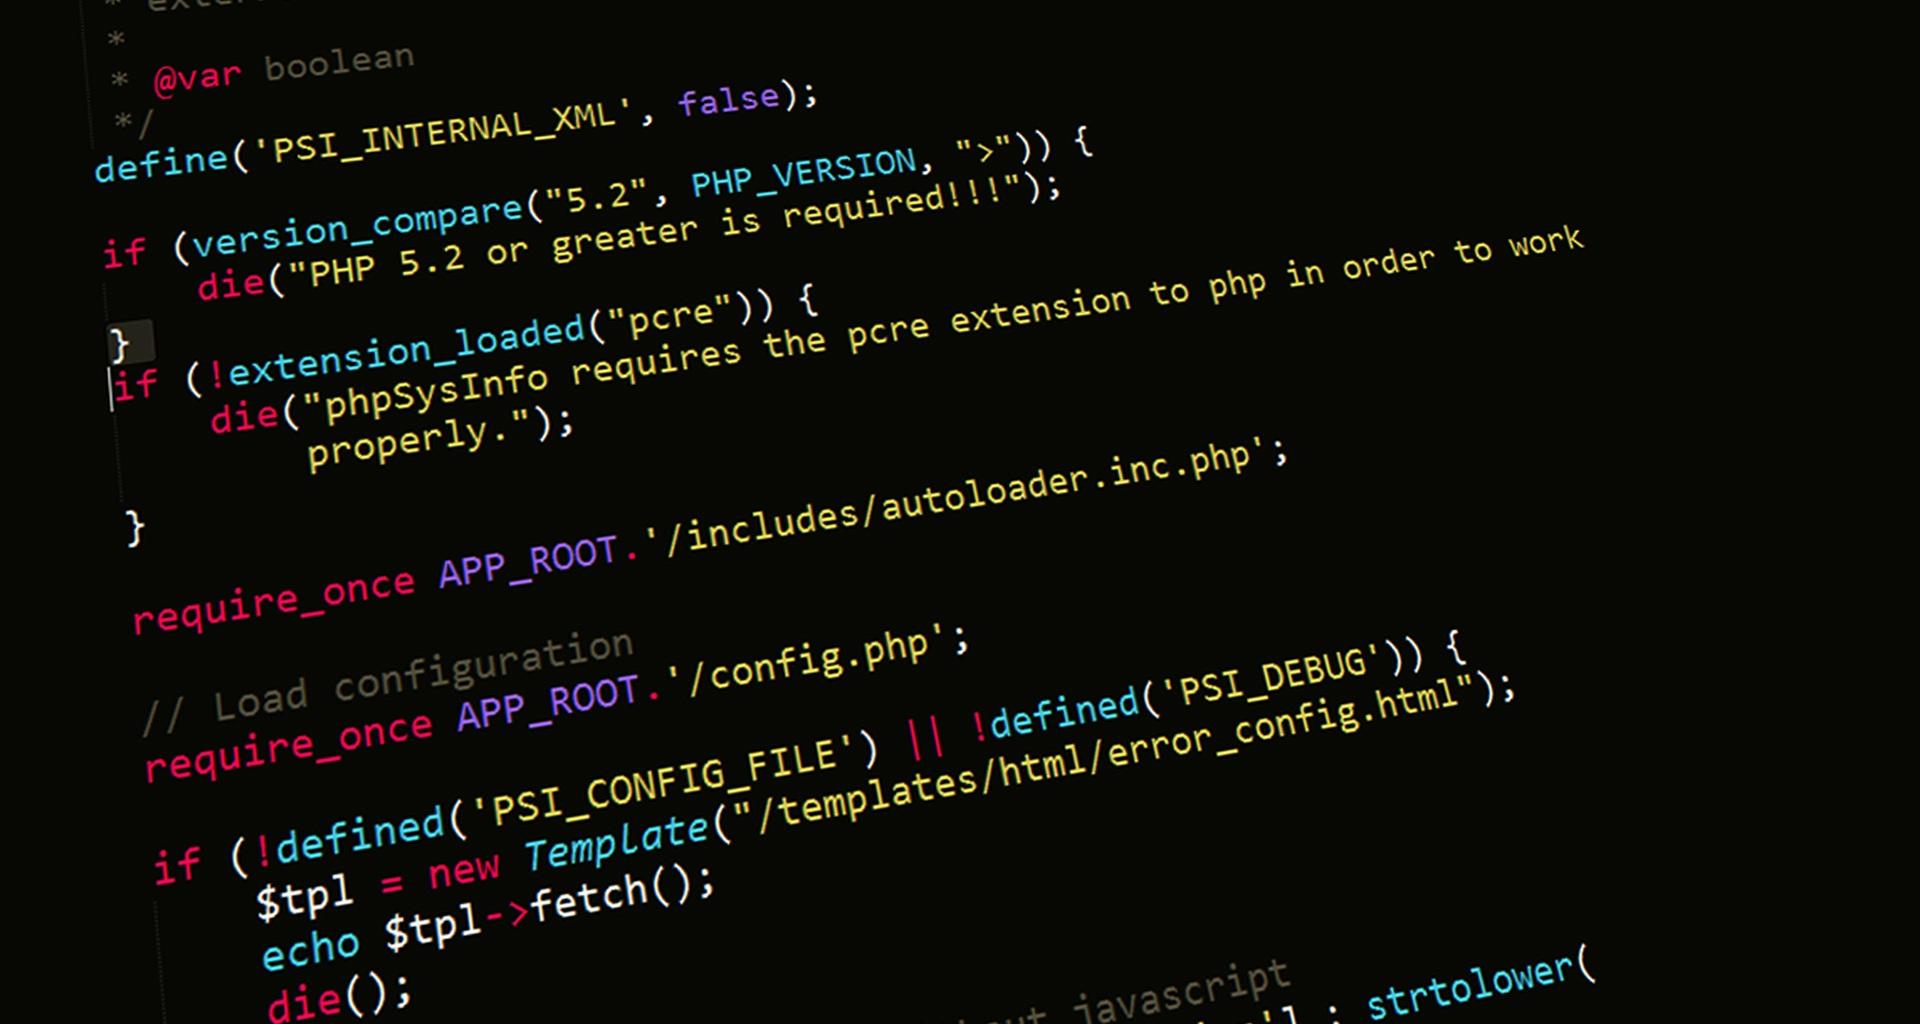 Gambar komputer jaringan garis pemrograman merek fon teks komputer jaringan garis pemrograman merek fon teks diagram presentasi pengembangan kode screenshot php ccuart Choice Image